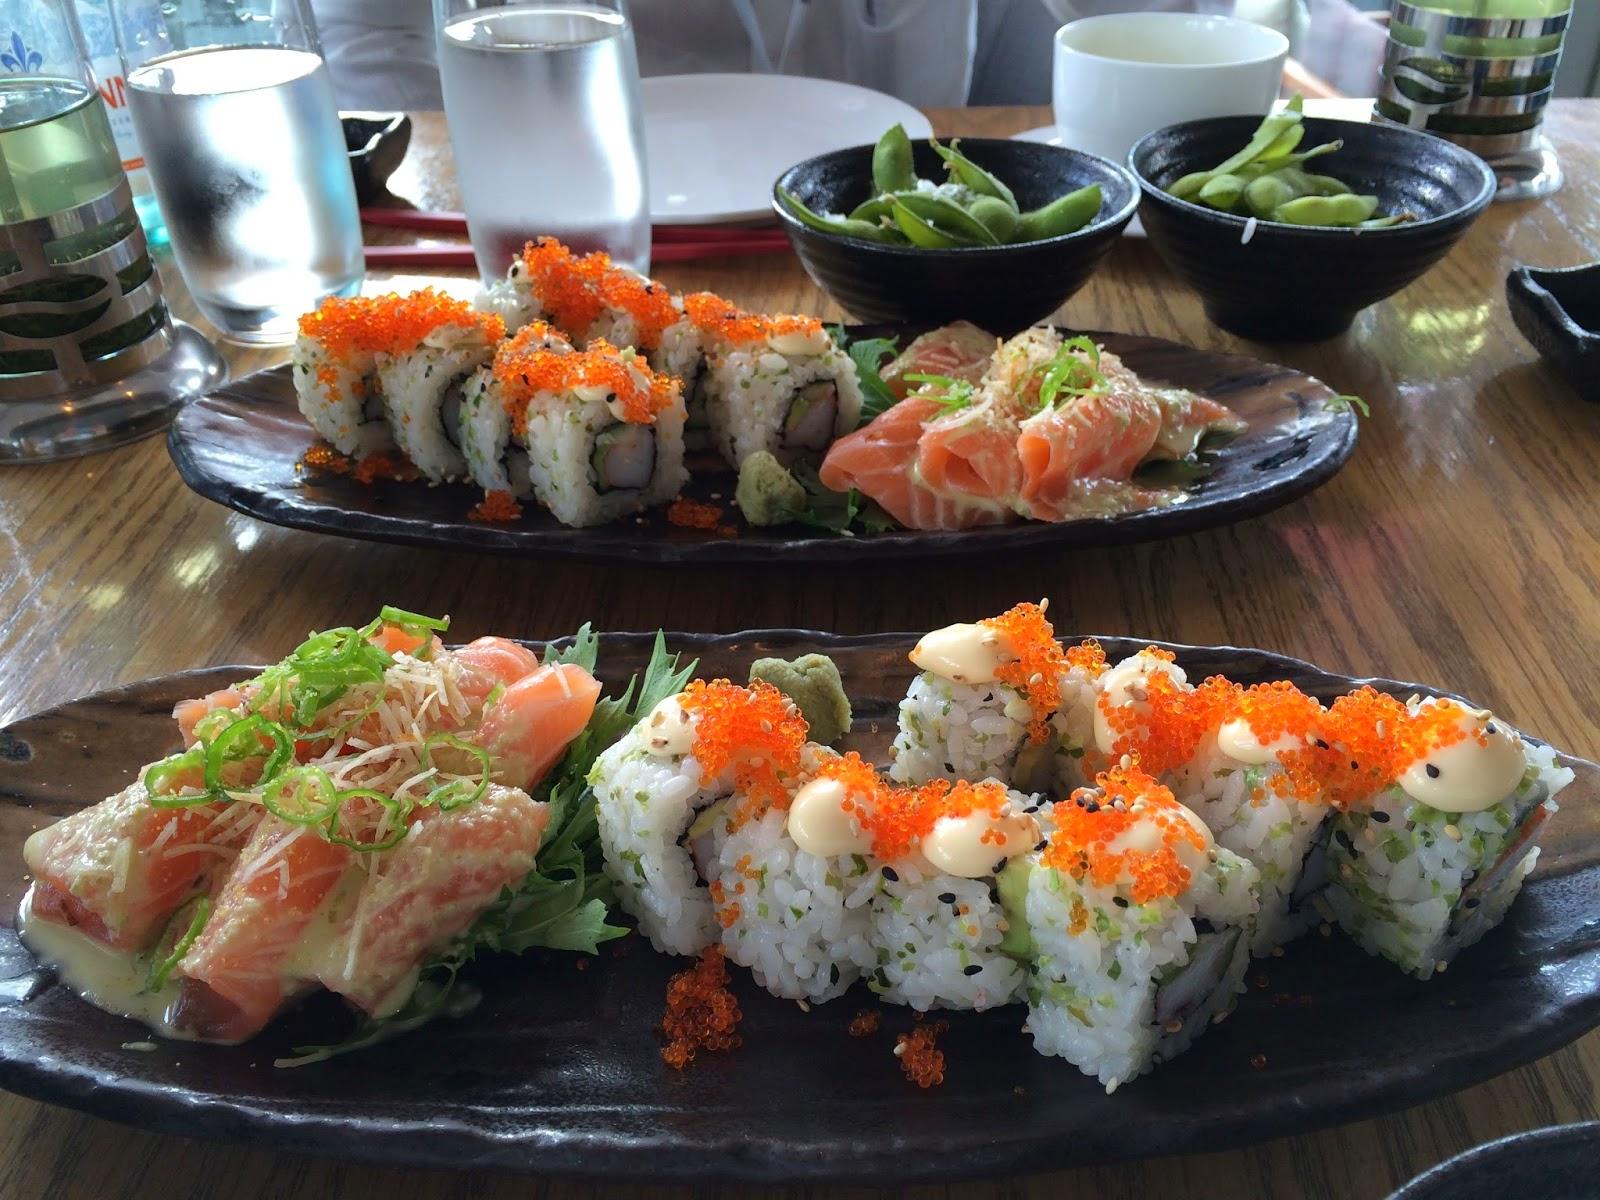 Sushi, sashimi and edamame at Ku De Ta, Marina Bay Sands Singapore